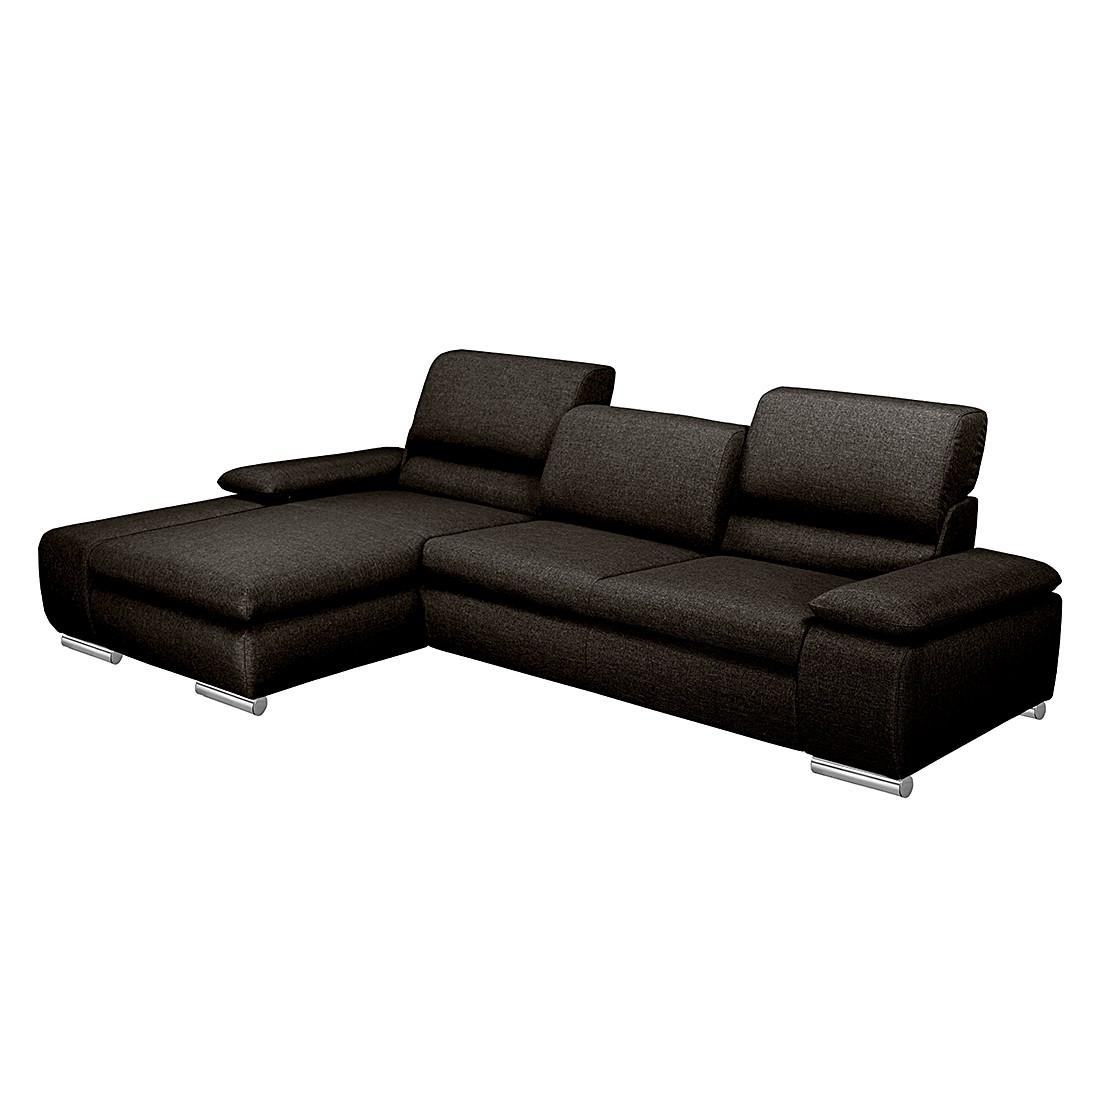 ecksofa theresa webstoff grau longchair davorstehend links ohne schlaffunktion nuovoform. Black Bedroom Furniture Sets. Home Design Ideas